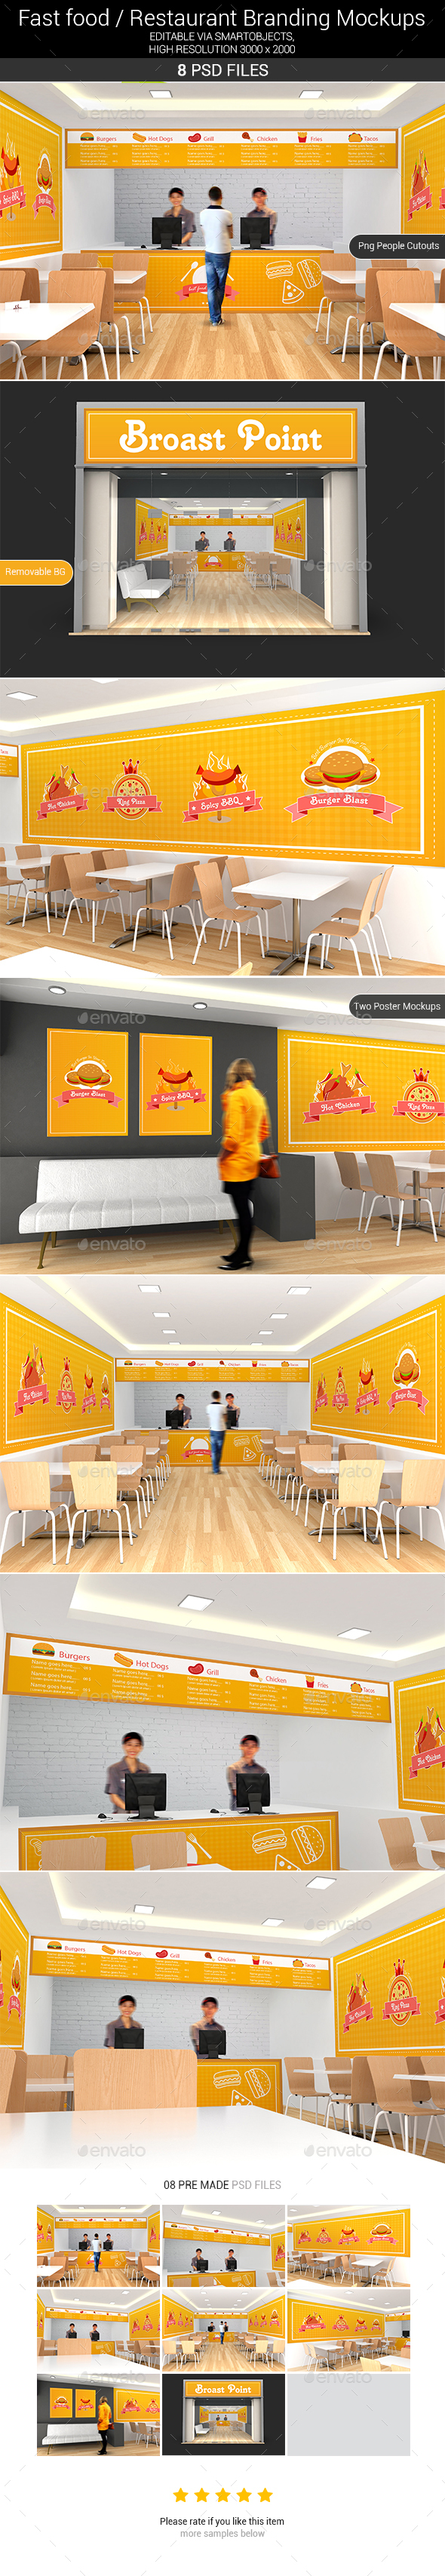 Fast food / Restaurant Branding Mockups - Product Mock-Ups Graphics